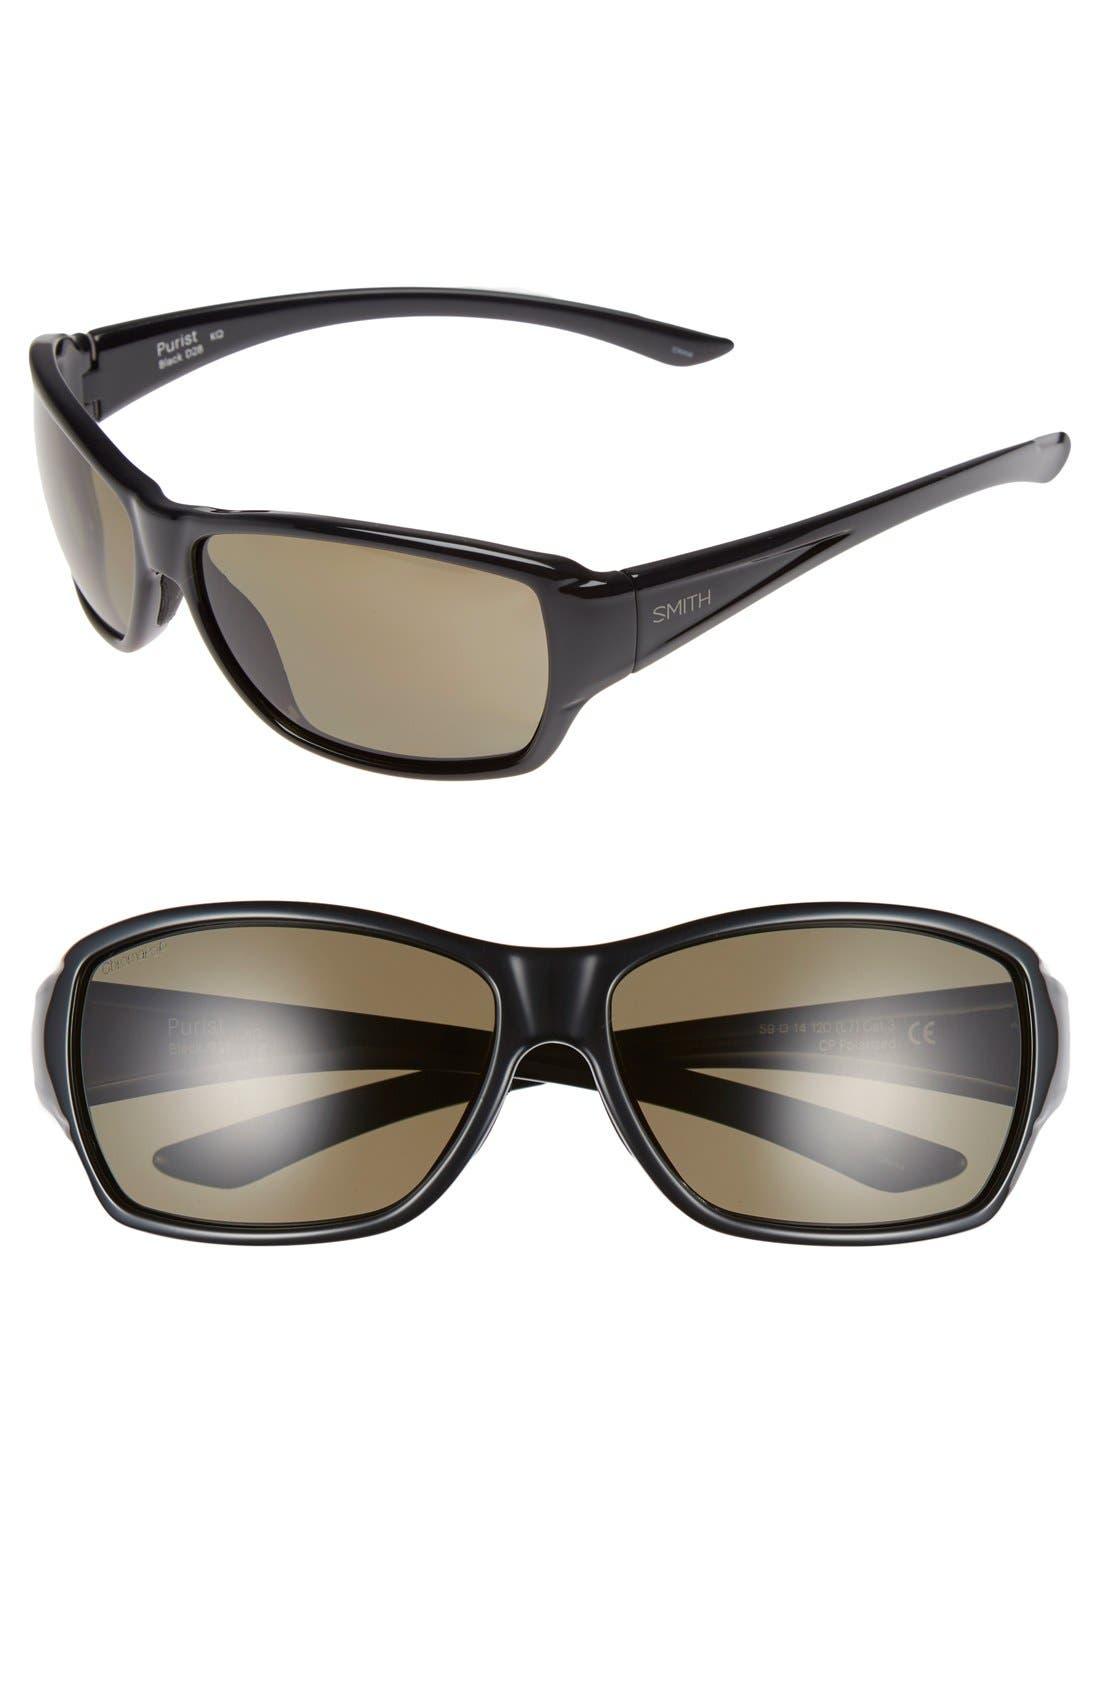 Smith 'Purist' 59mm Polarized Sunglasses